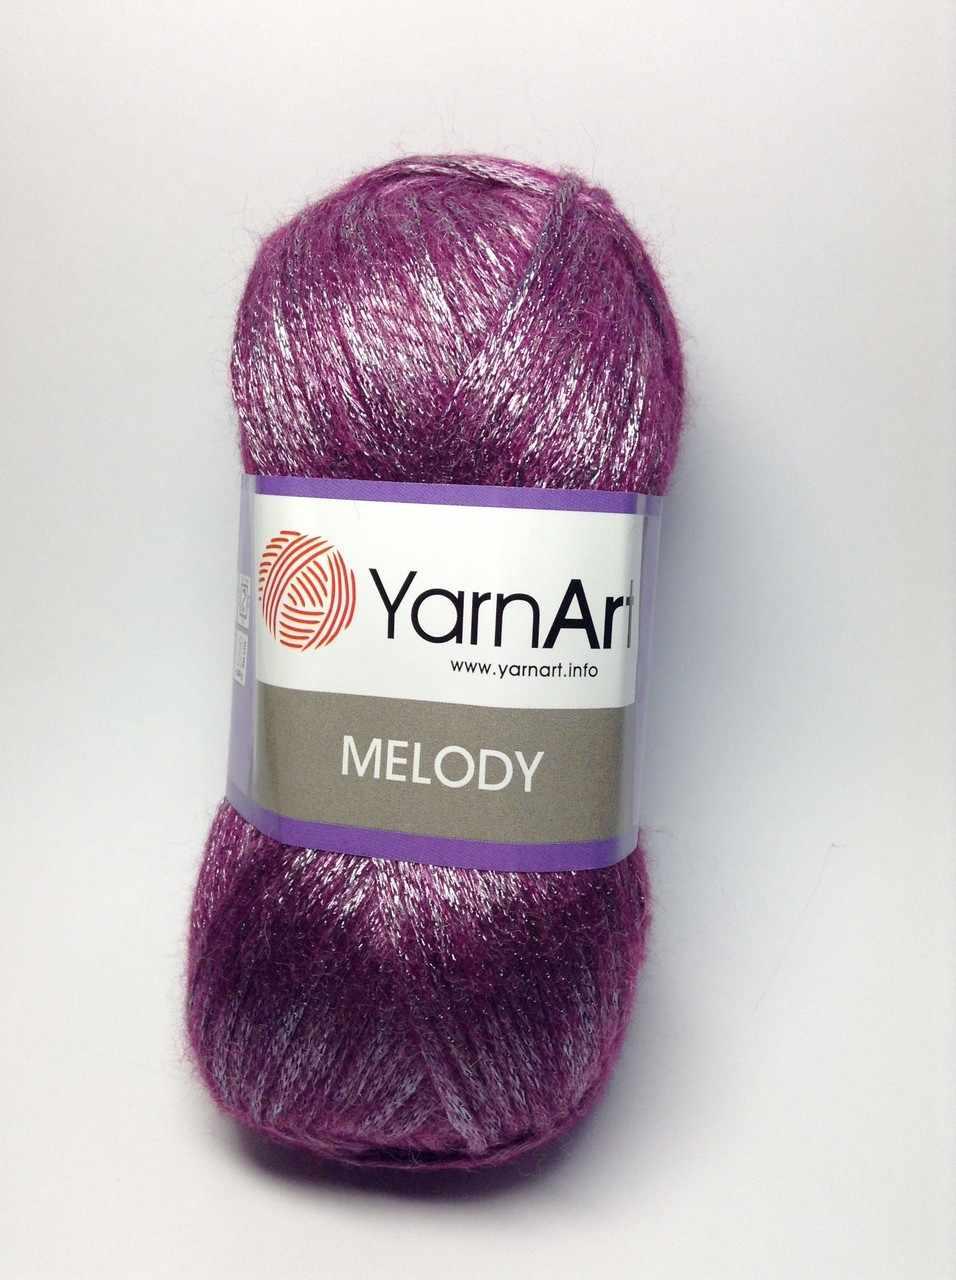 Пряжа YarnArt Melody Цвет.883 Фиолетовый меланж